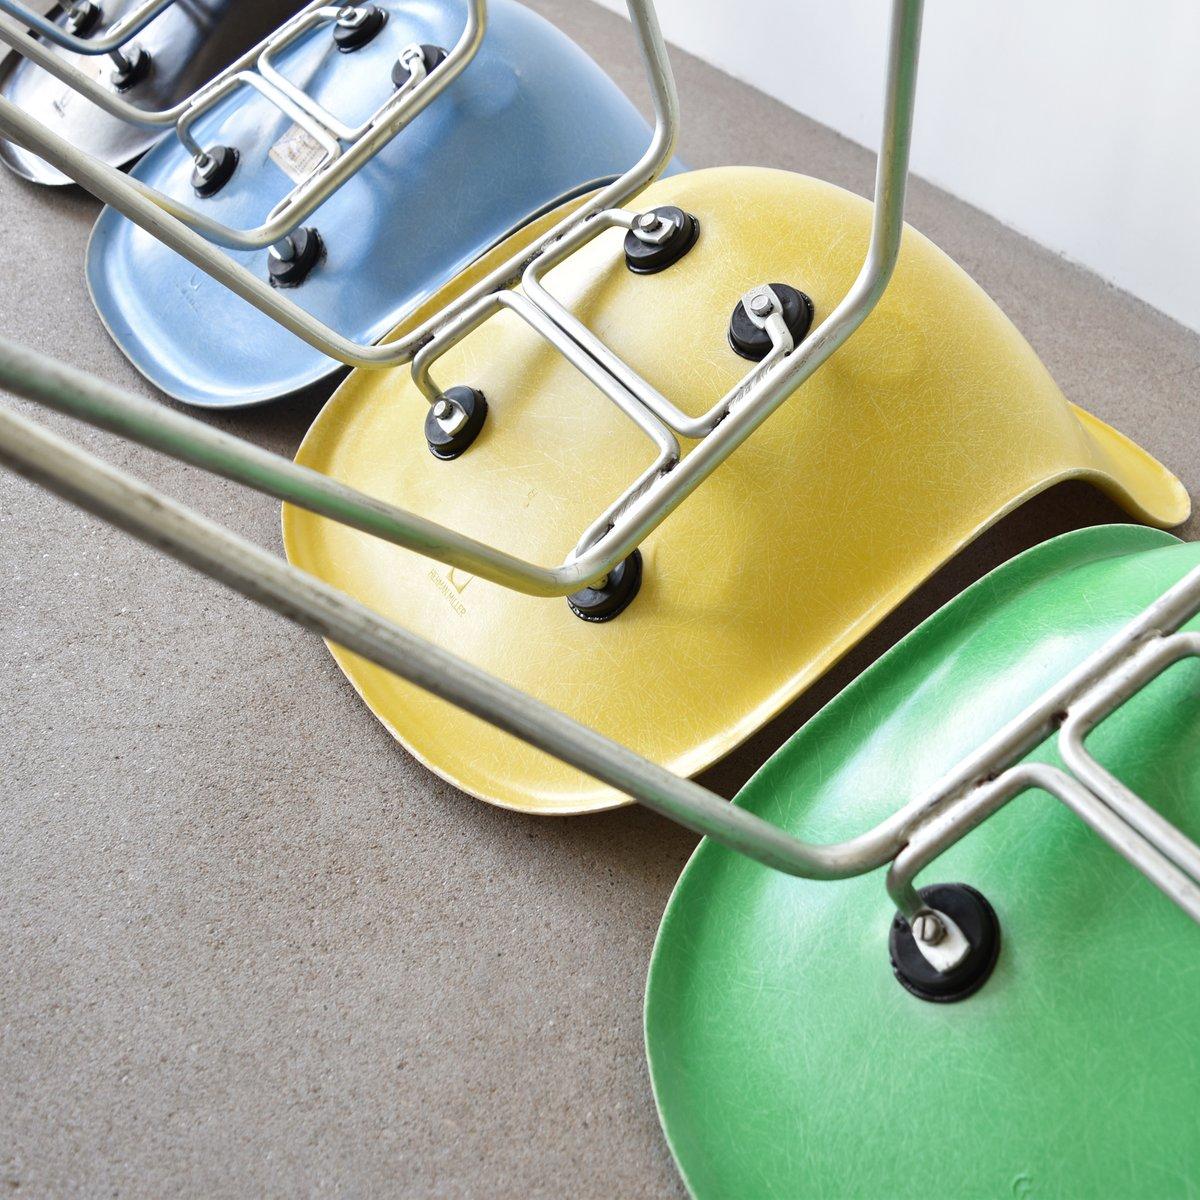 Herman Miller Furniture: Vintage Chairs, Tables & More